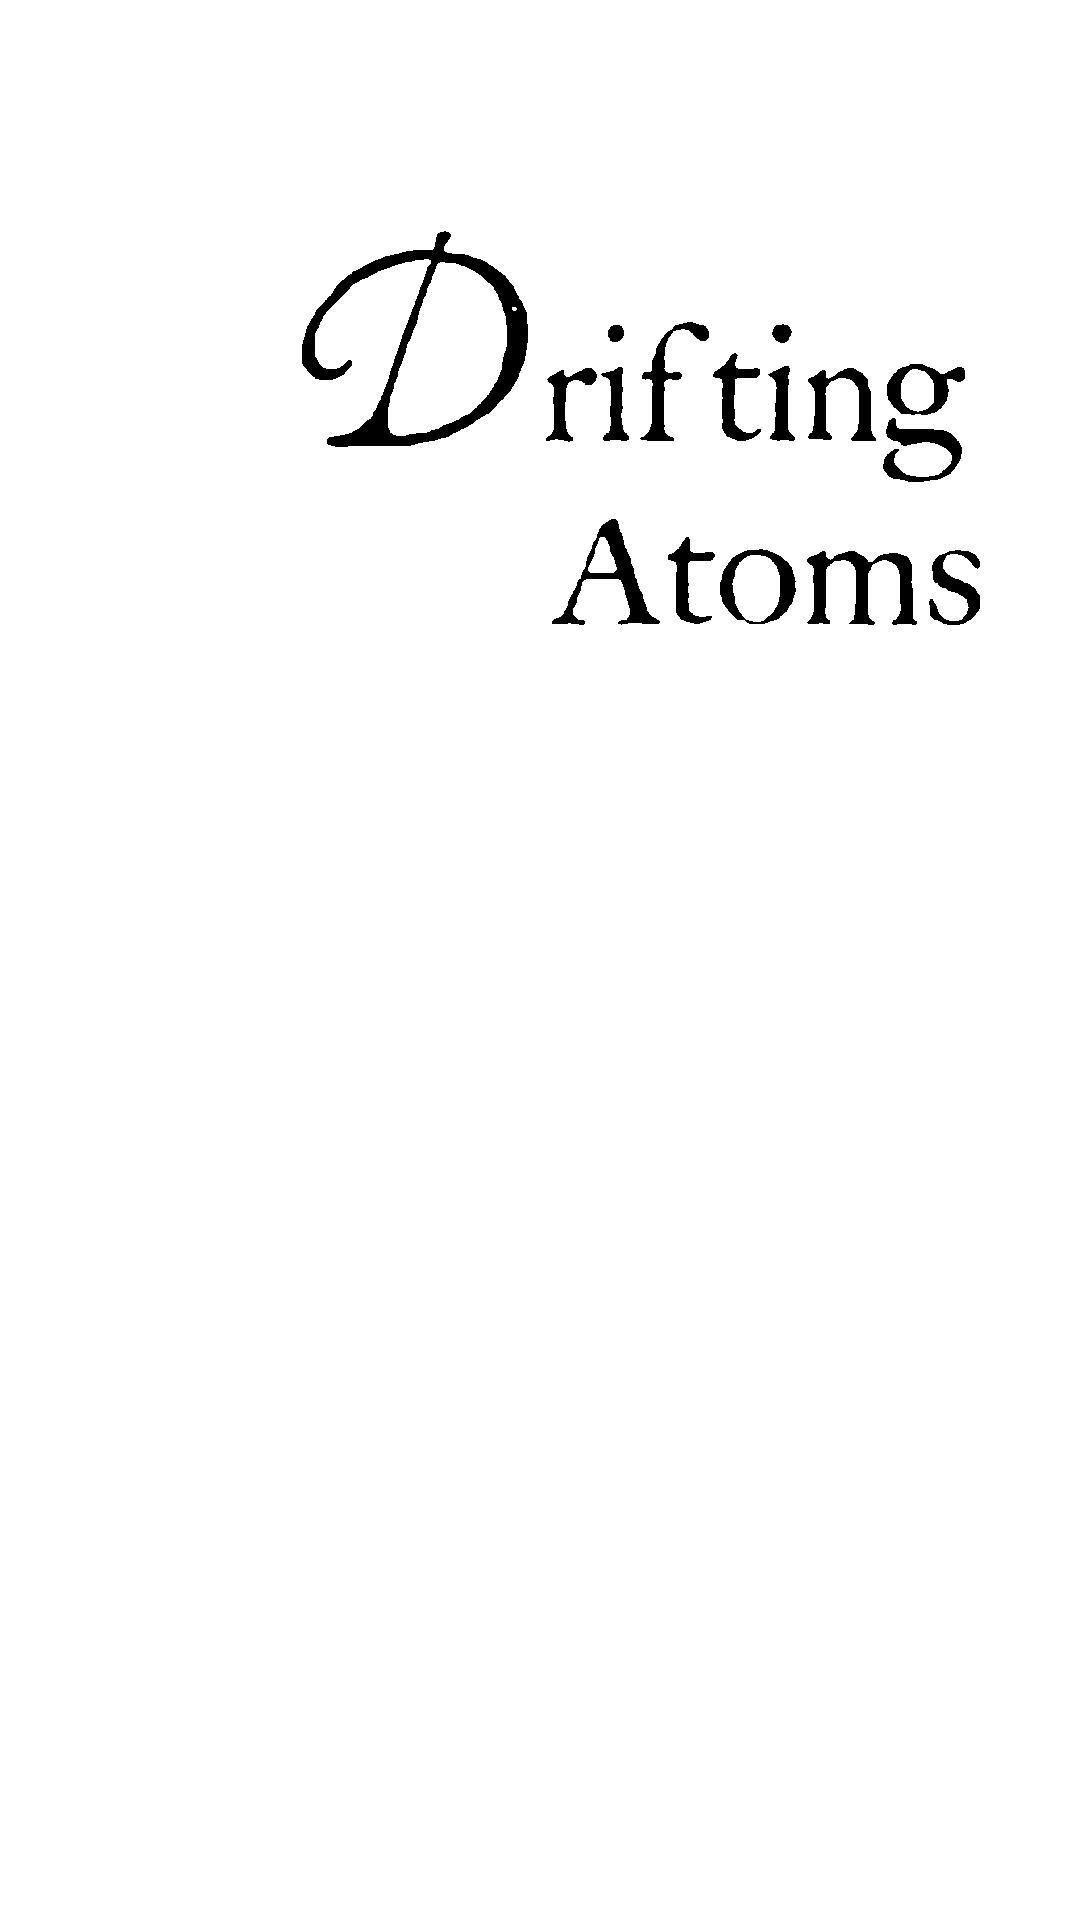 driftingatoms.jpg